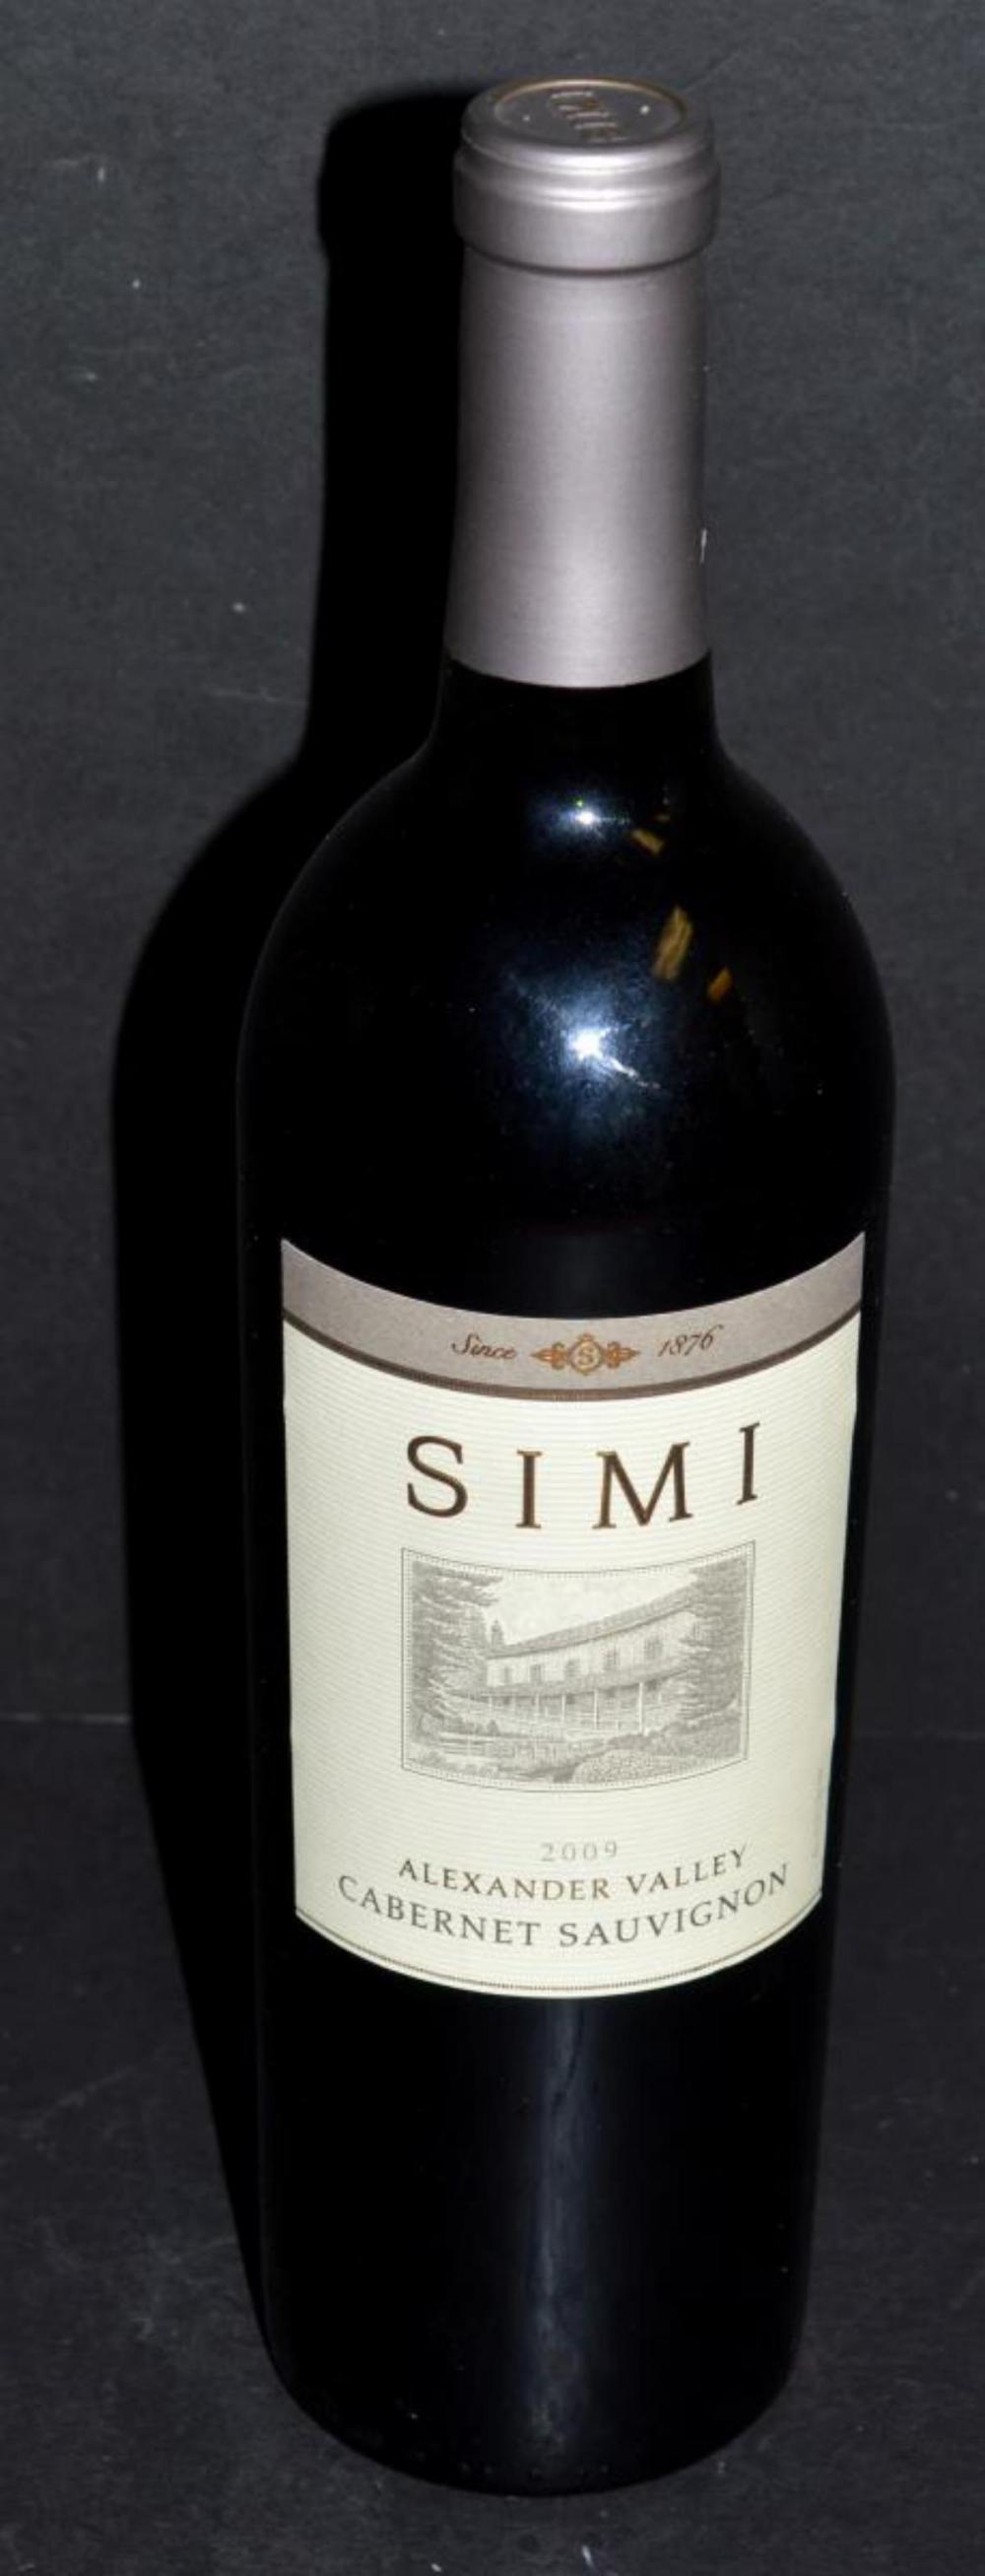 Simi Alexander Valley 2009 Cabernet Sauvignon Wine